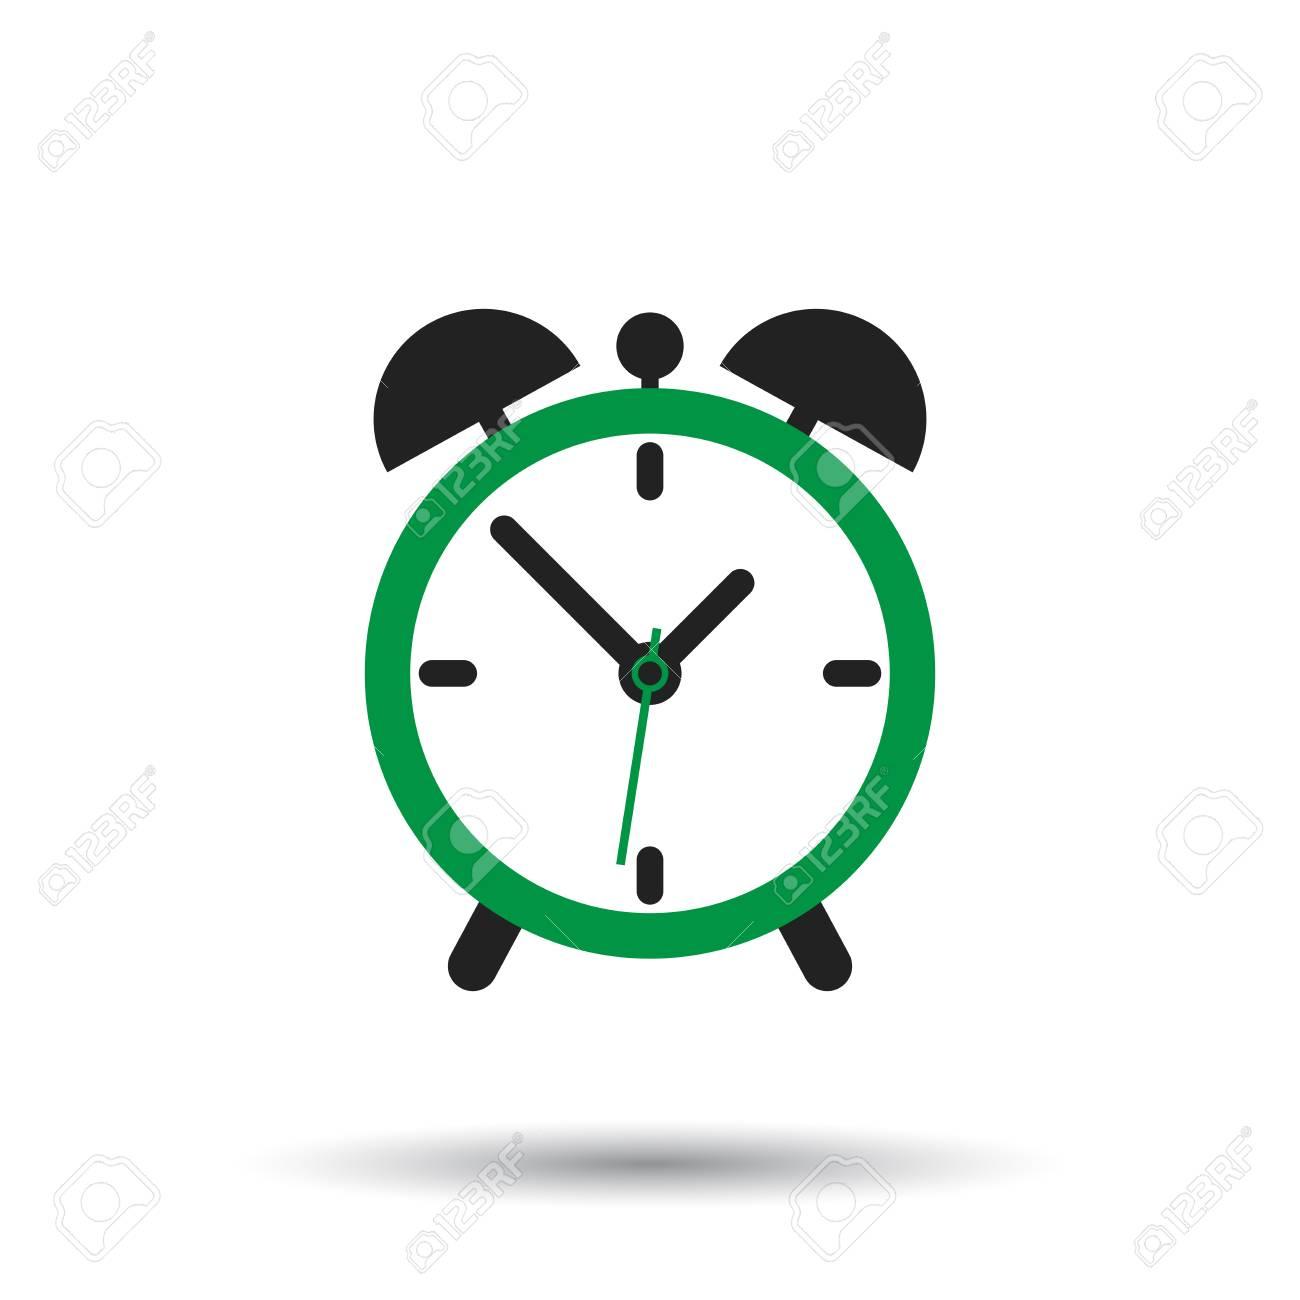 Alarm clock icon  Flat design style  Simple icon on white background